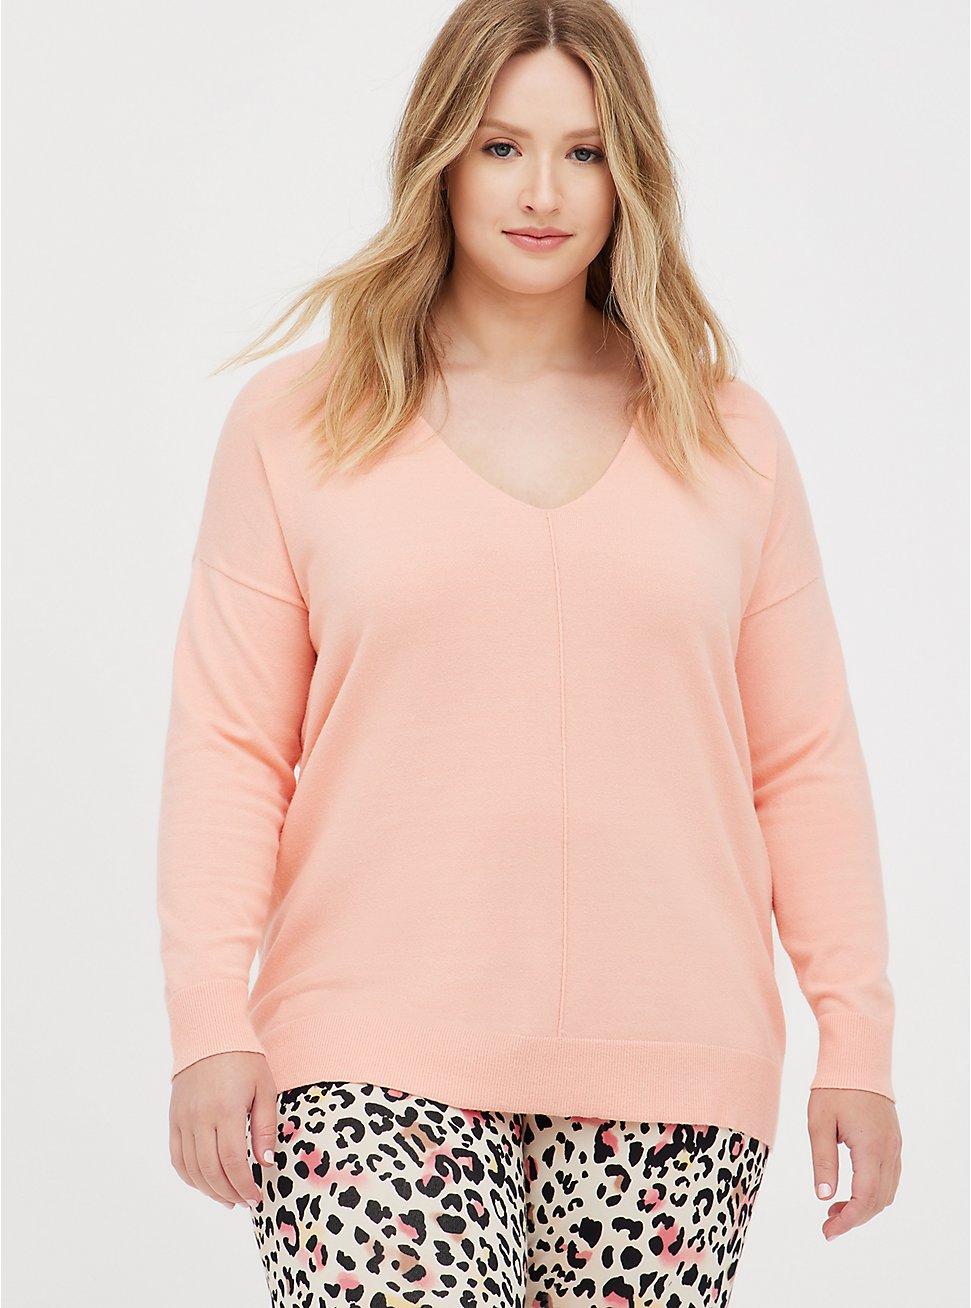 Pullover Sweater - Drop Shoulder Peach , PEACH, hi-res